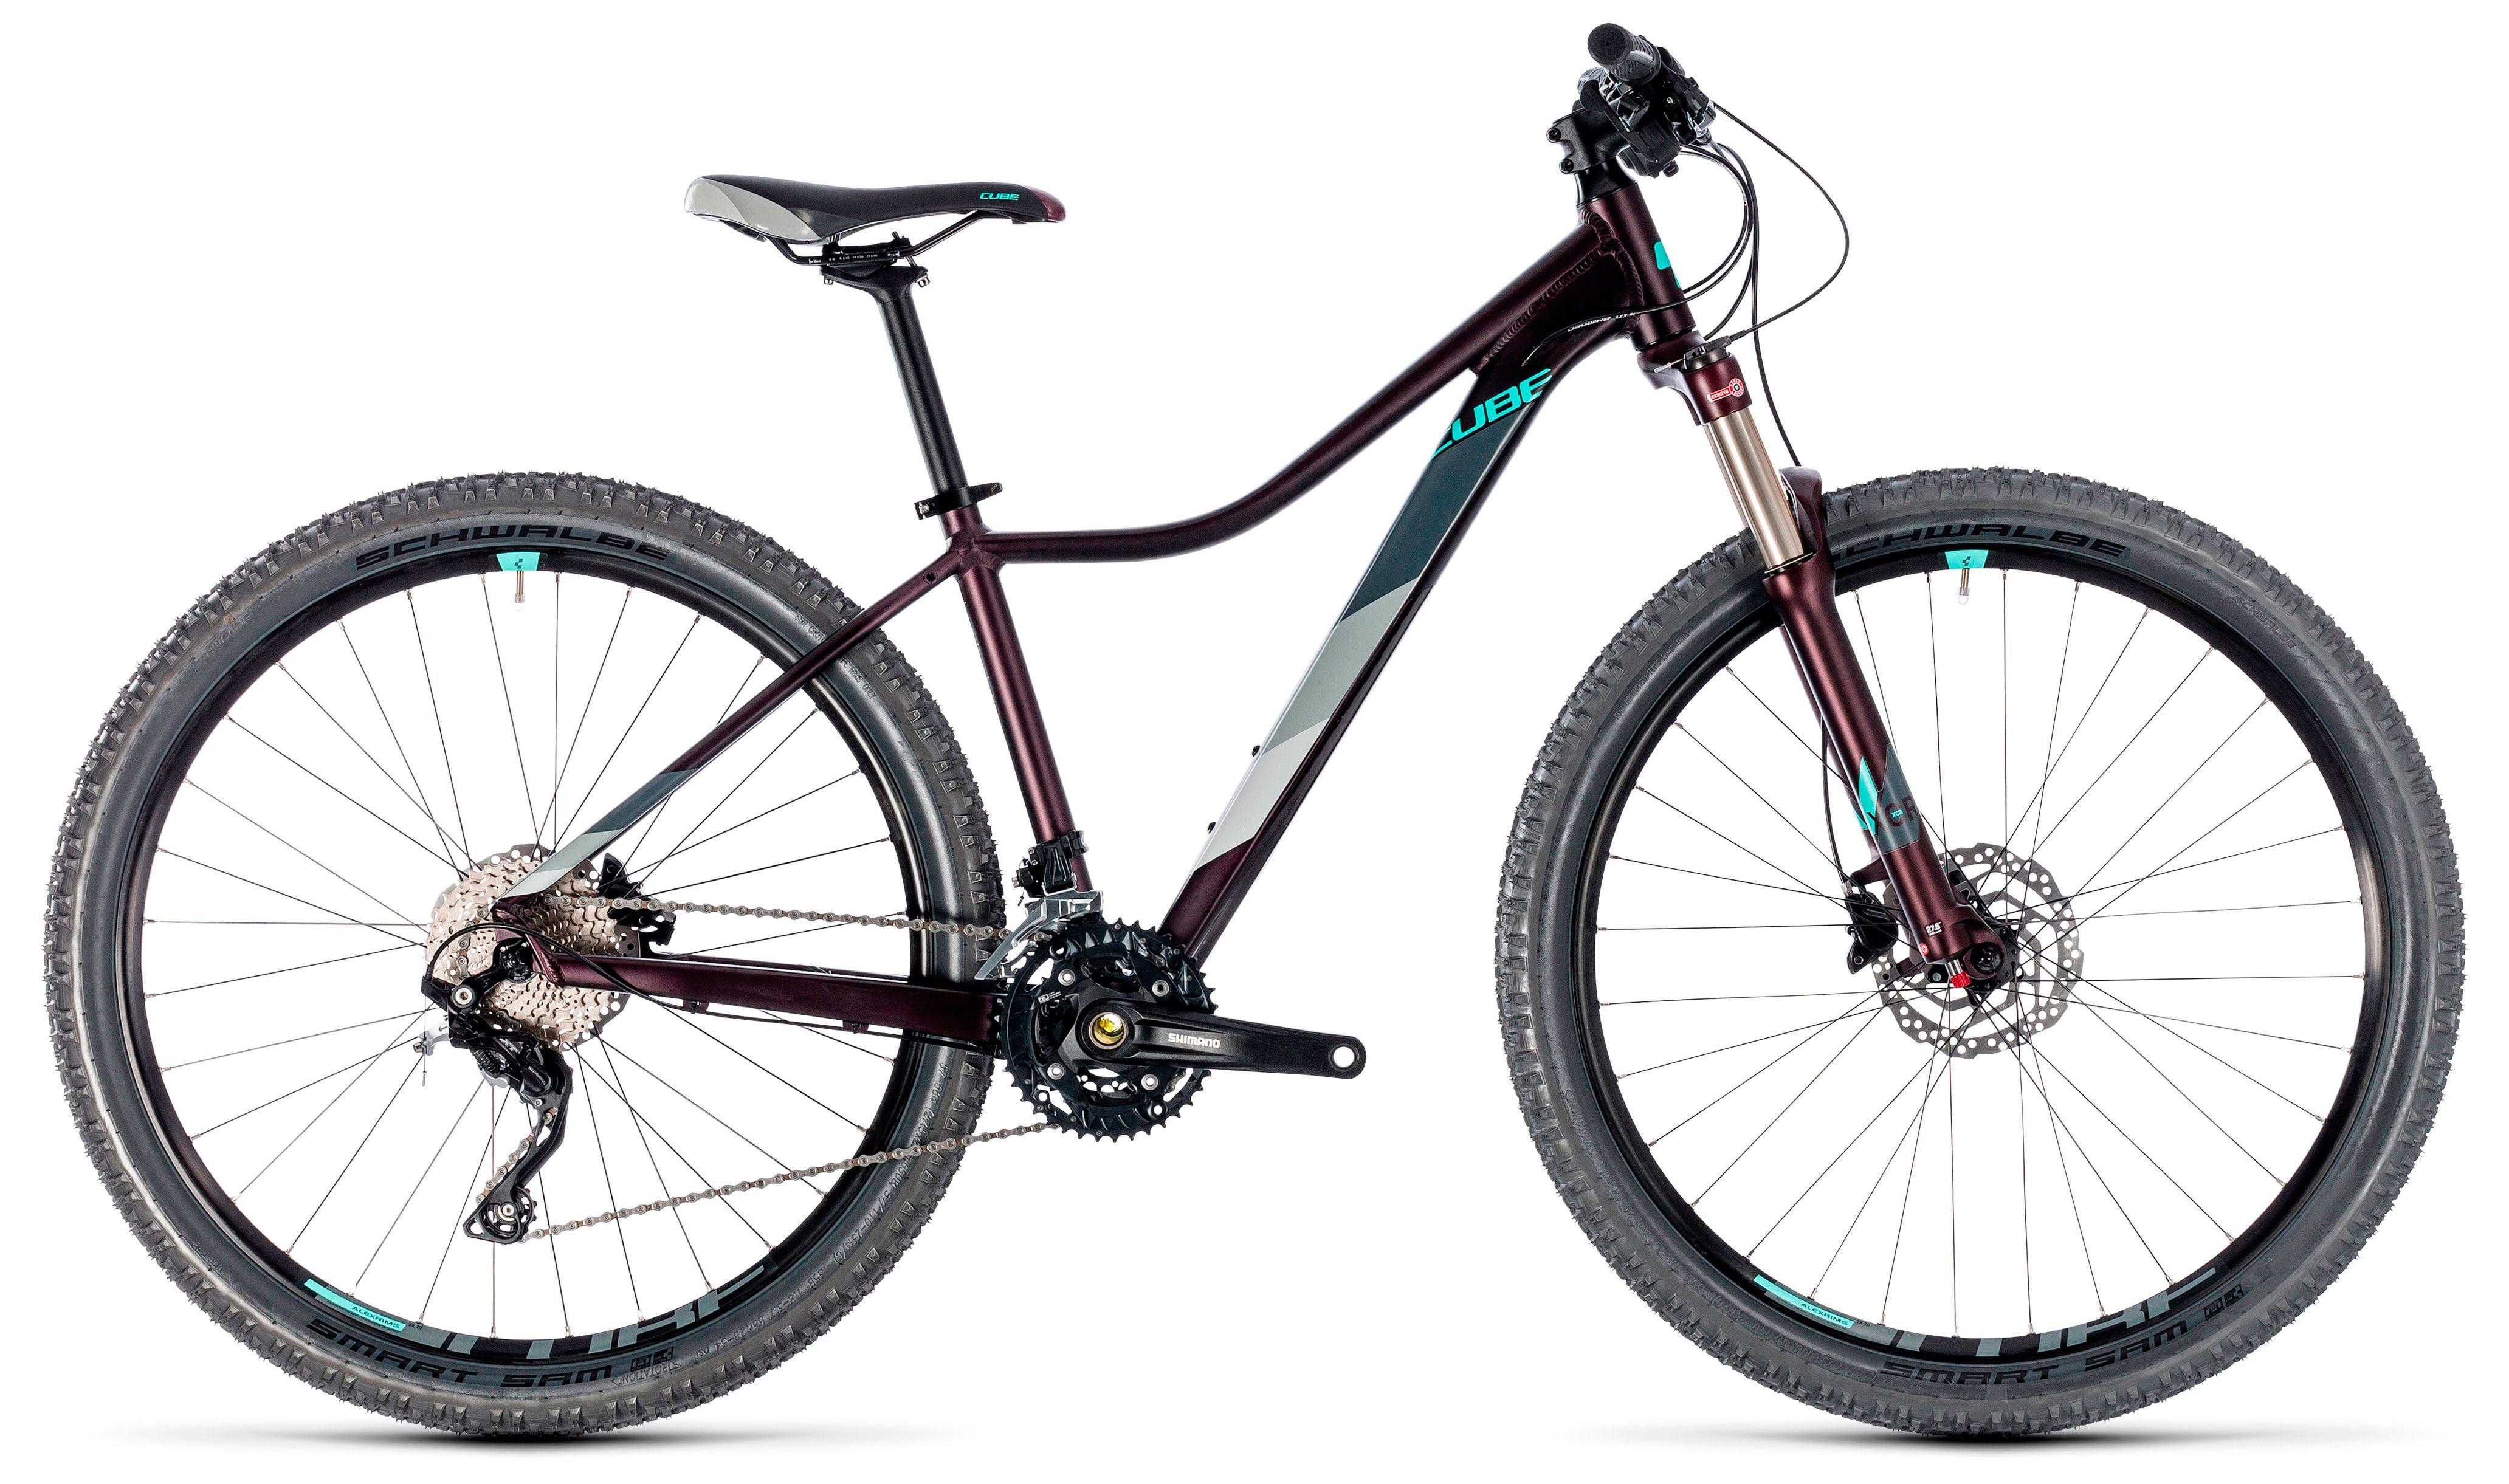 Велосипед Cube Access WS Race 27,5 2018,  Женские  - артикул:290581